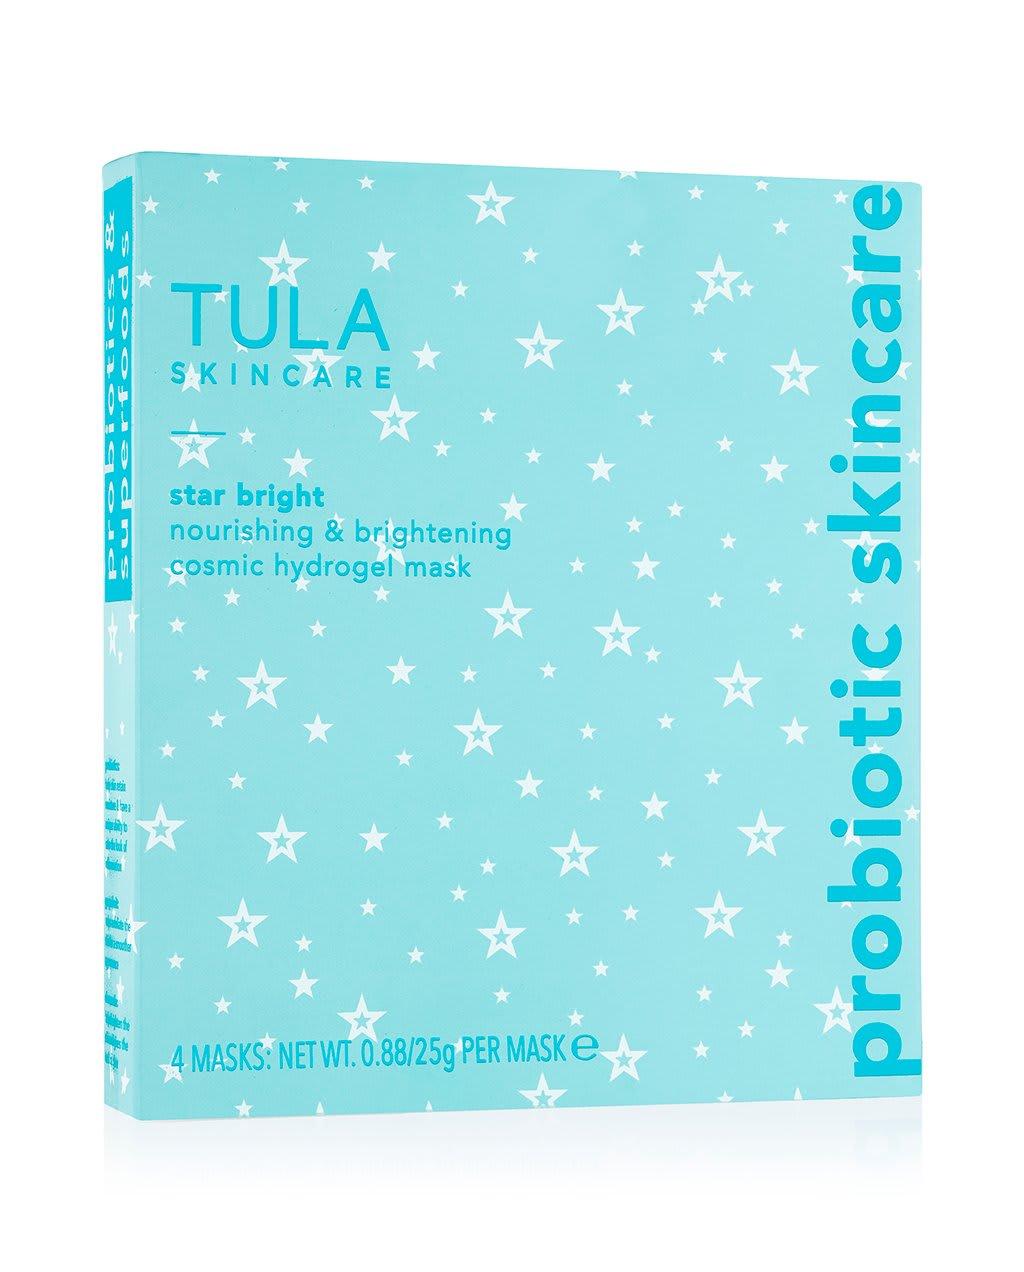 nourishing & brightening hydrogel mask | Tula Skincare